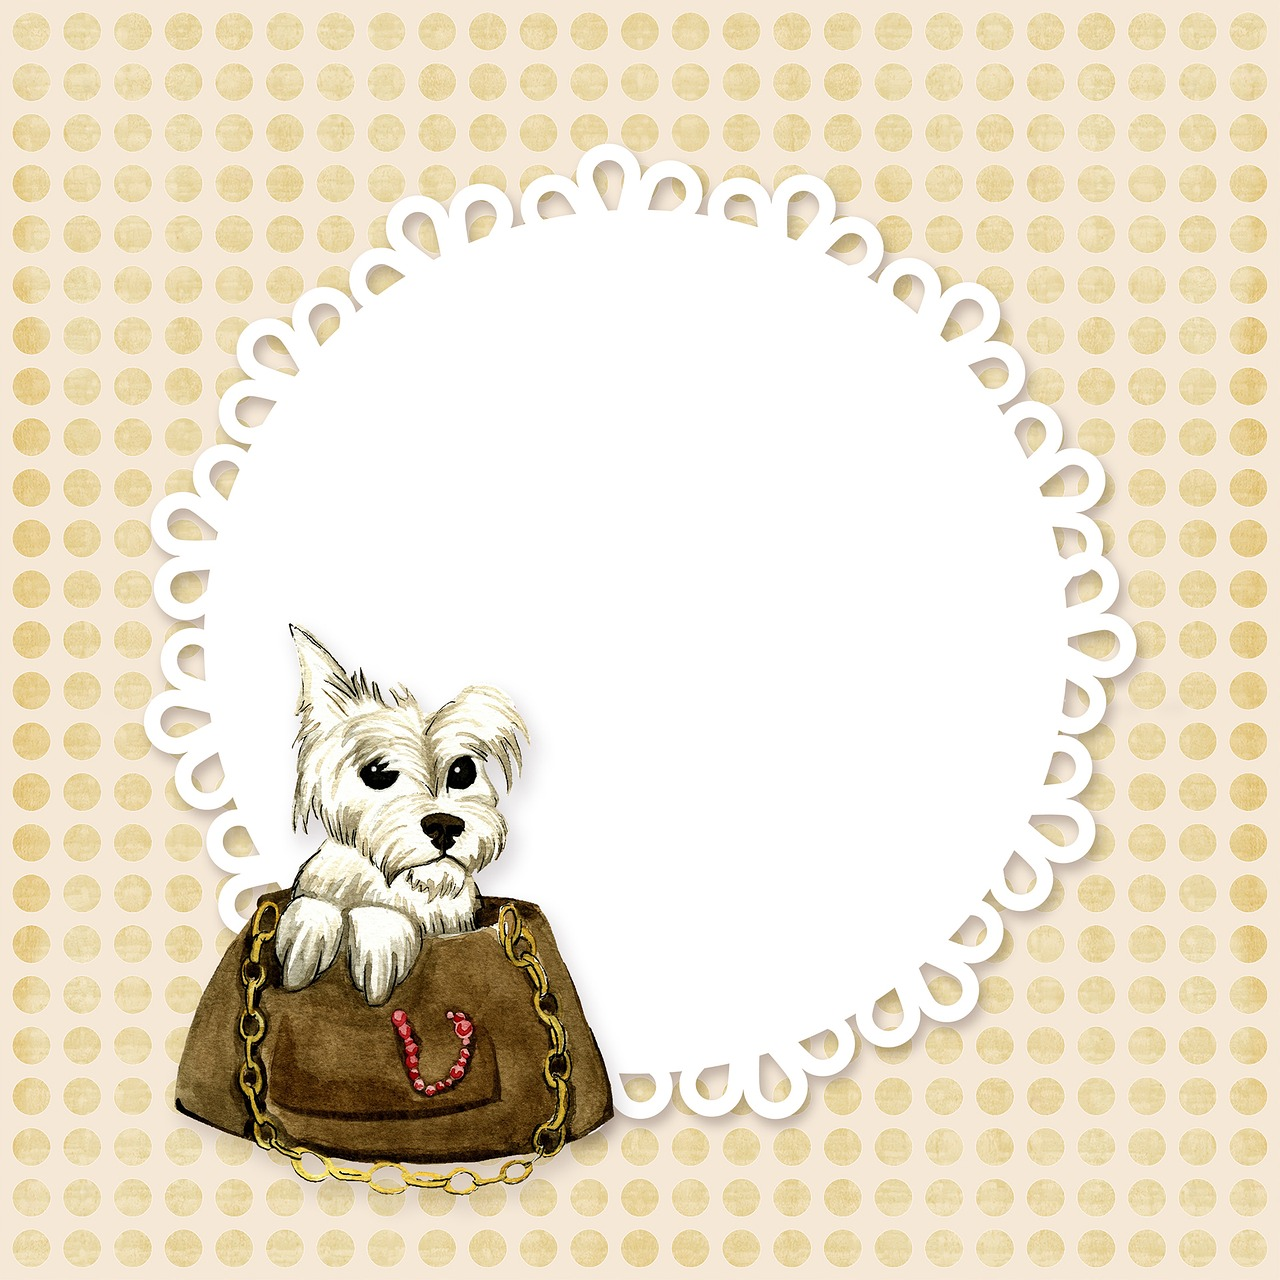 https://cdn.pixabay.com/photo/2017/12/03/09/28/dog-2994499_1280.jpg